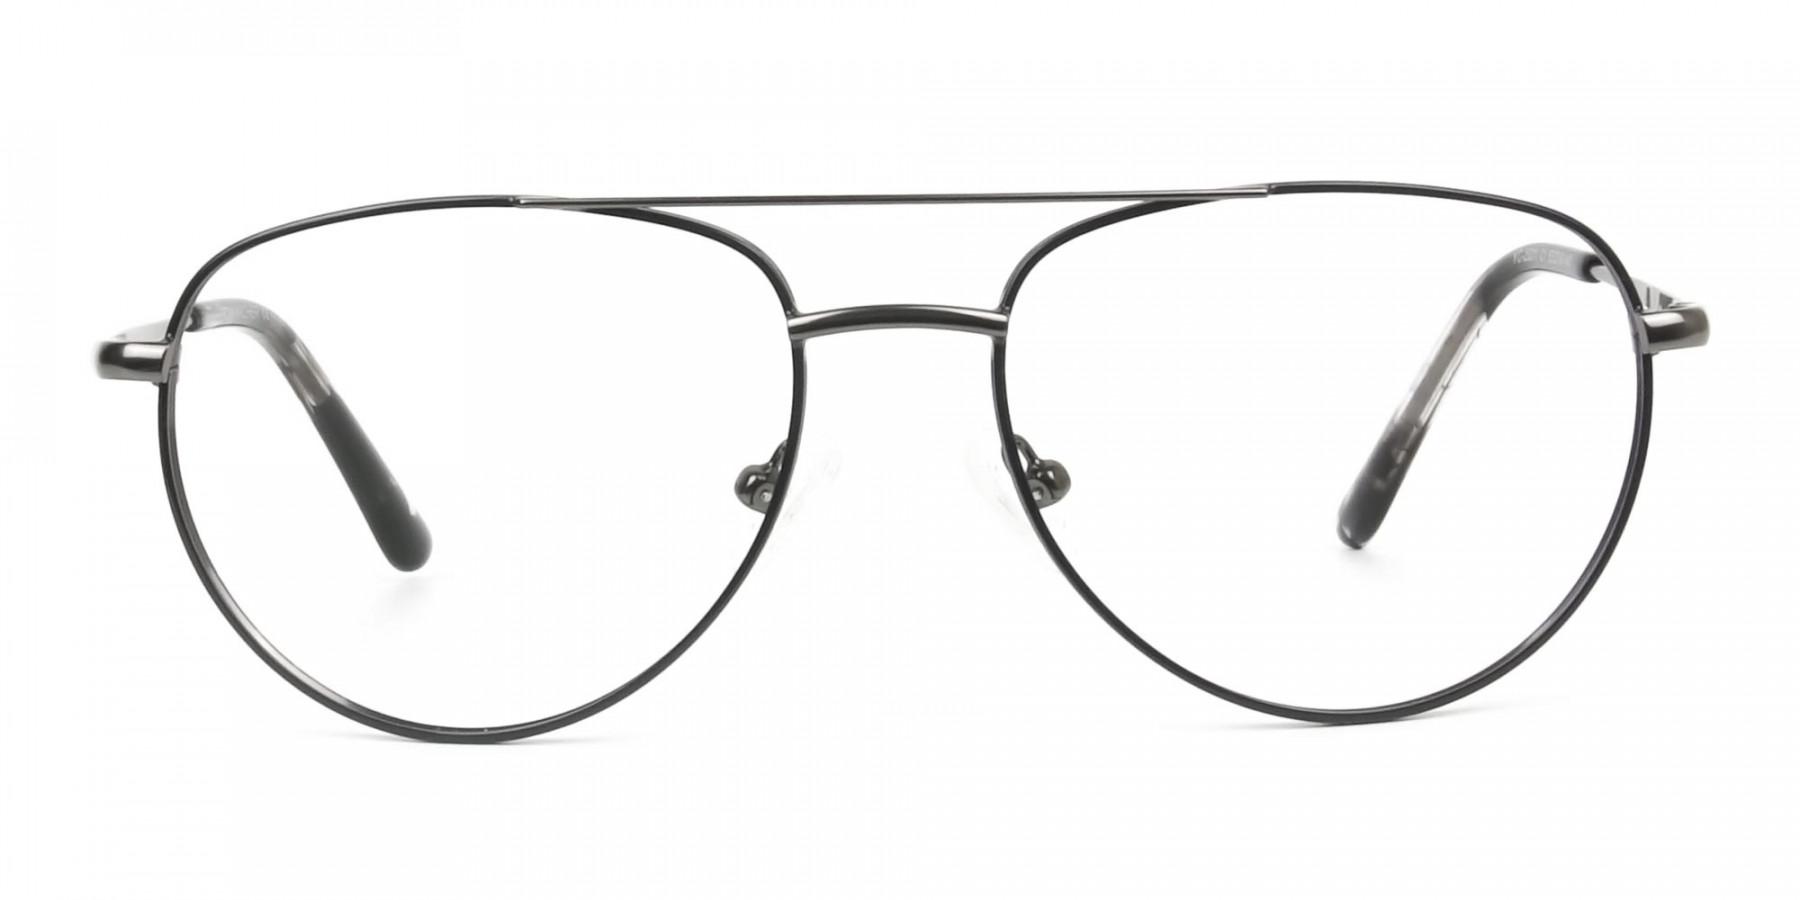 Black and Dark Gunmetal Aviator Glasses - 1